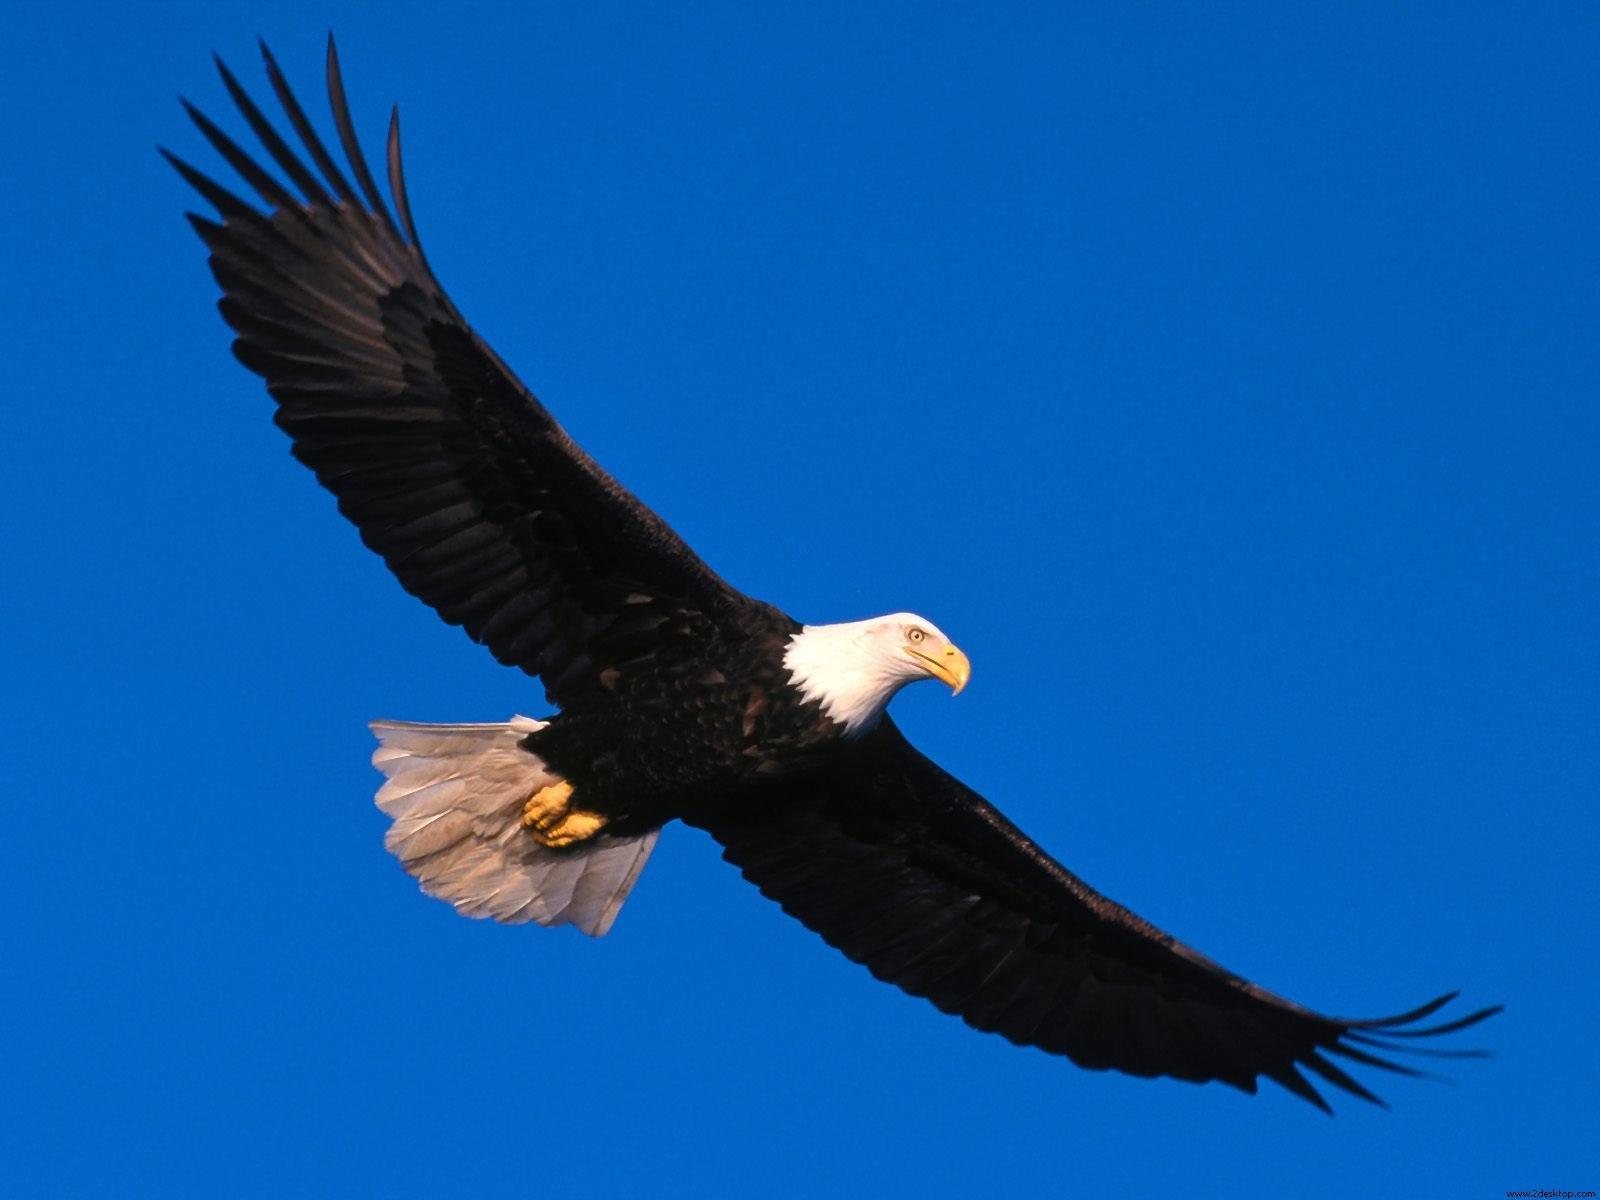 http://1.bp.blogspot.com/-FvxJiiRLtWM/UWdg4kg1KRI/AAAAAAAAfb8/h_iHPVS2LEI/s1600/Aguila-Volando-Alto-Wallpapers-HD.jpg